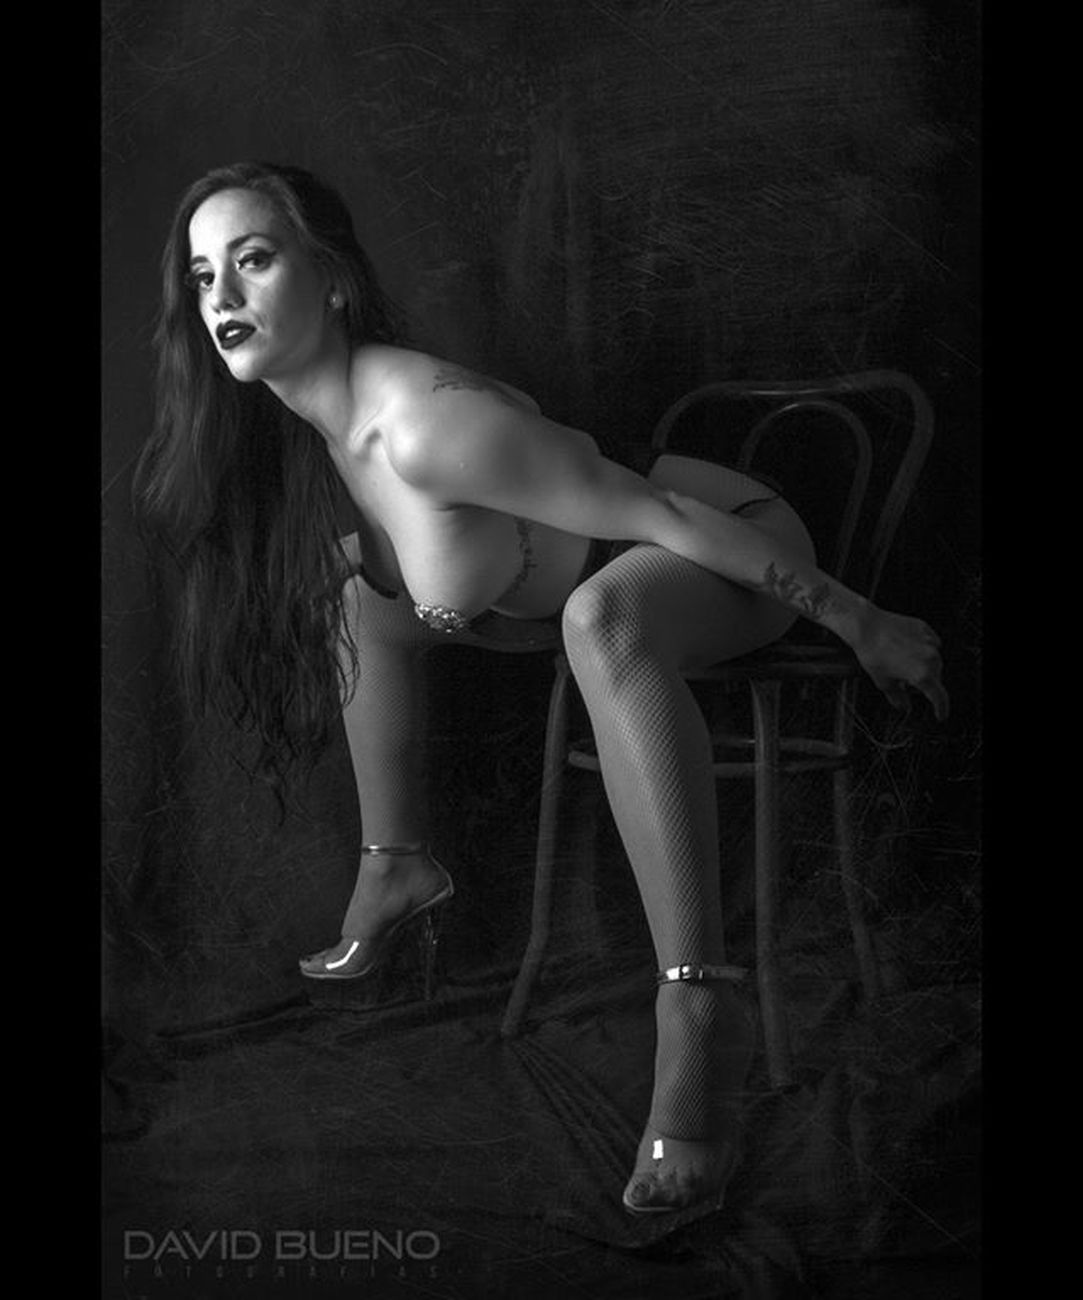 #modelo #sexy #hot #fashion #erotic #models #cute #sensuality #sensual #hair #melanie #hair #B&W #glamour #sesion